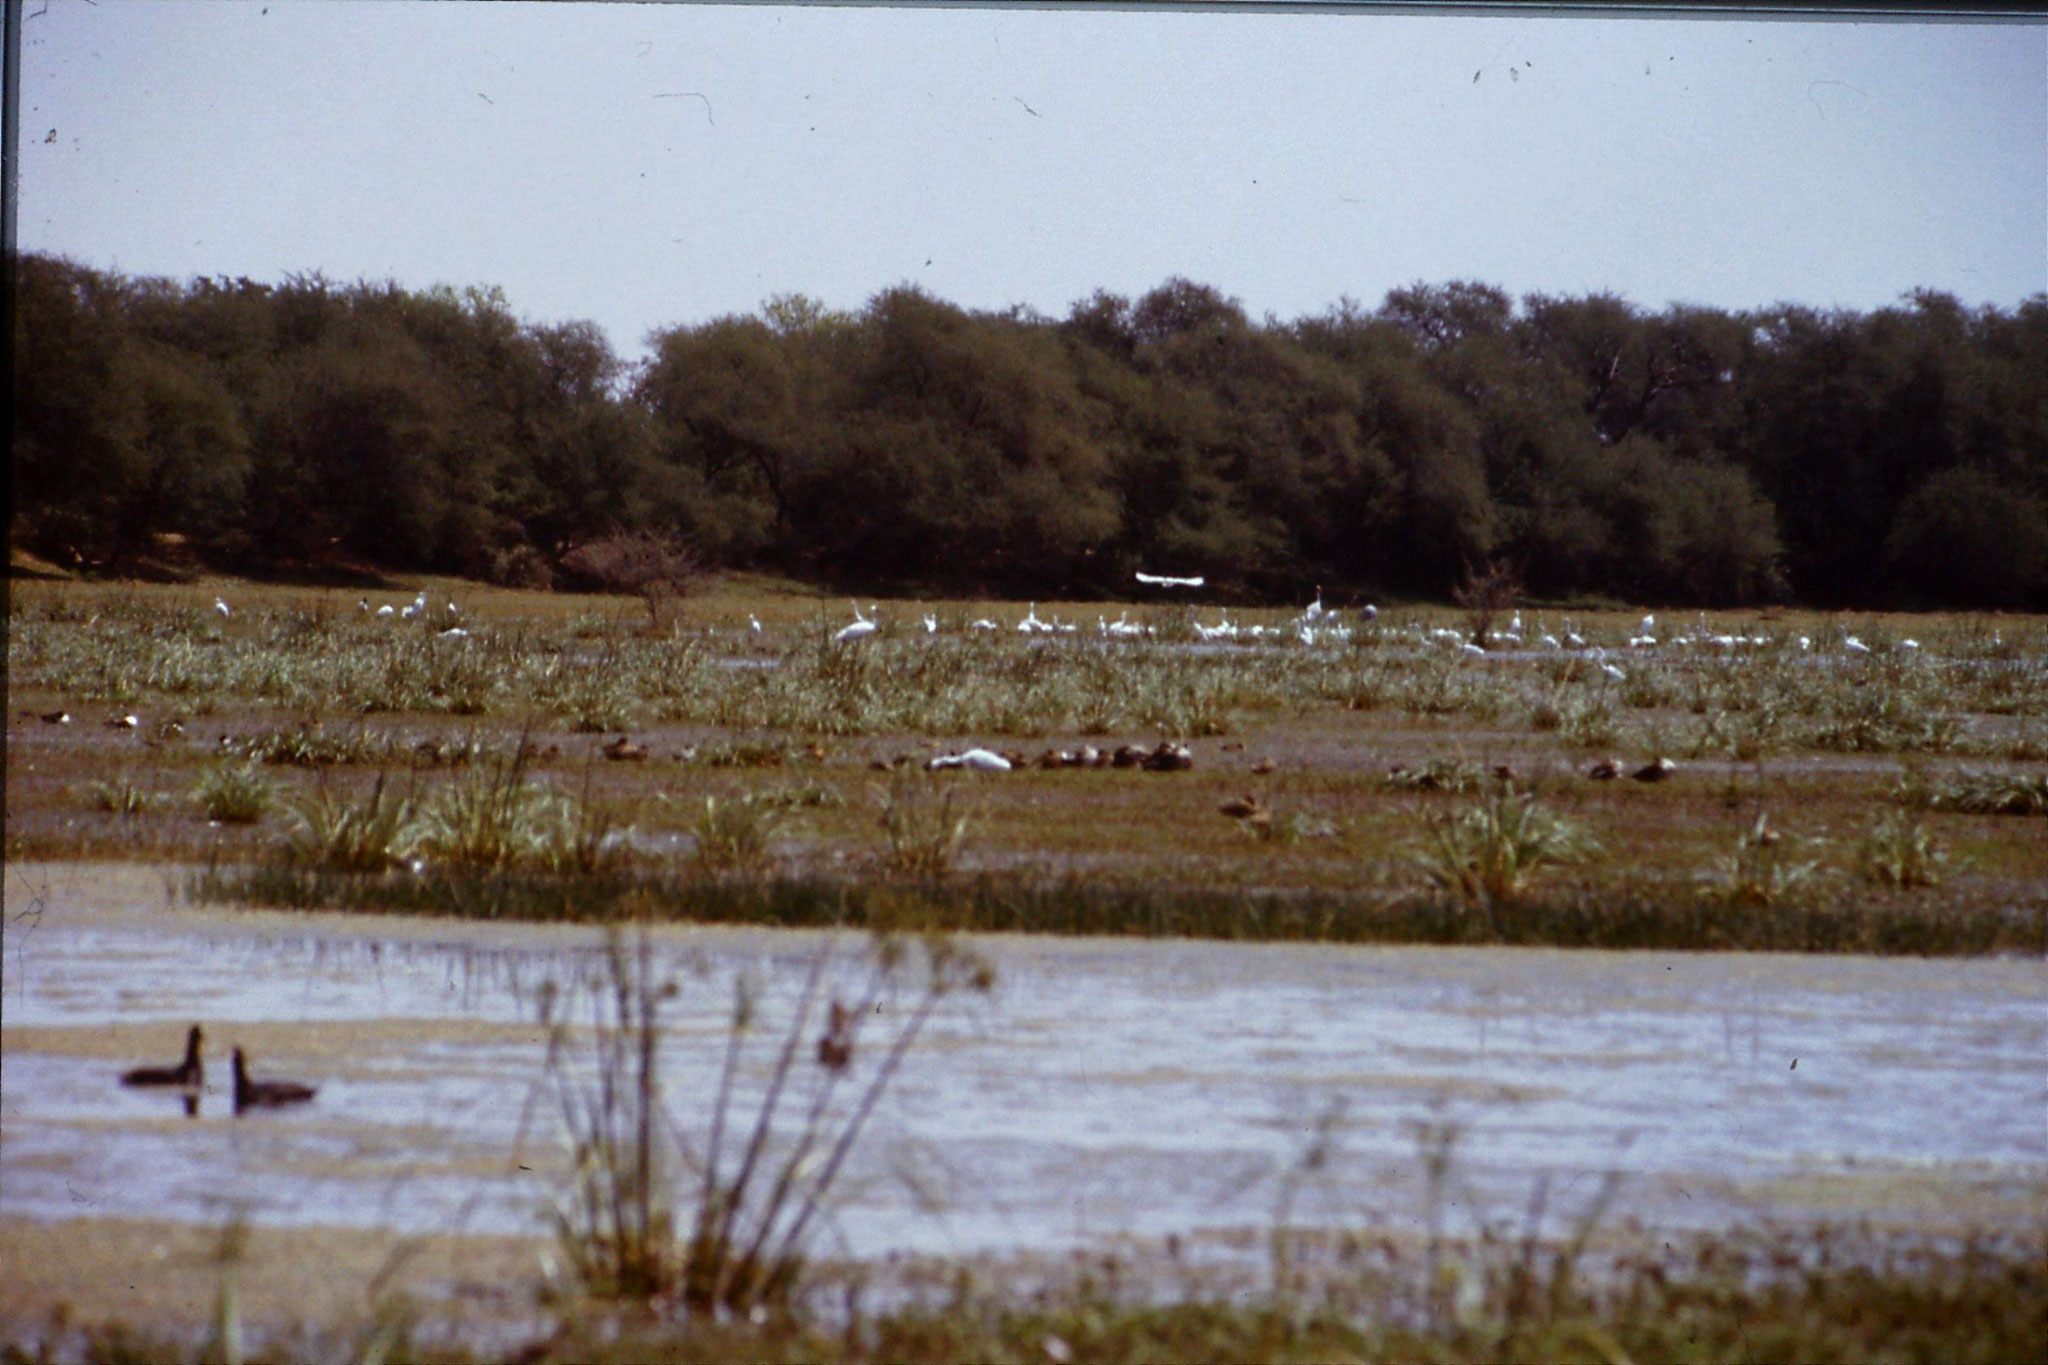 109/14: 1/4/1990 Bharatpur - Siberian crane in distance